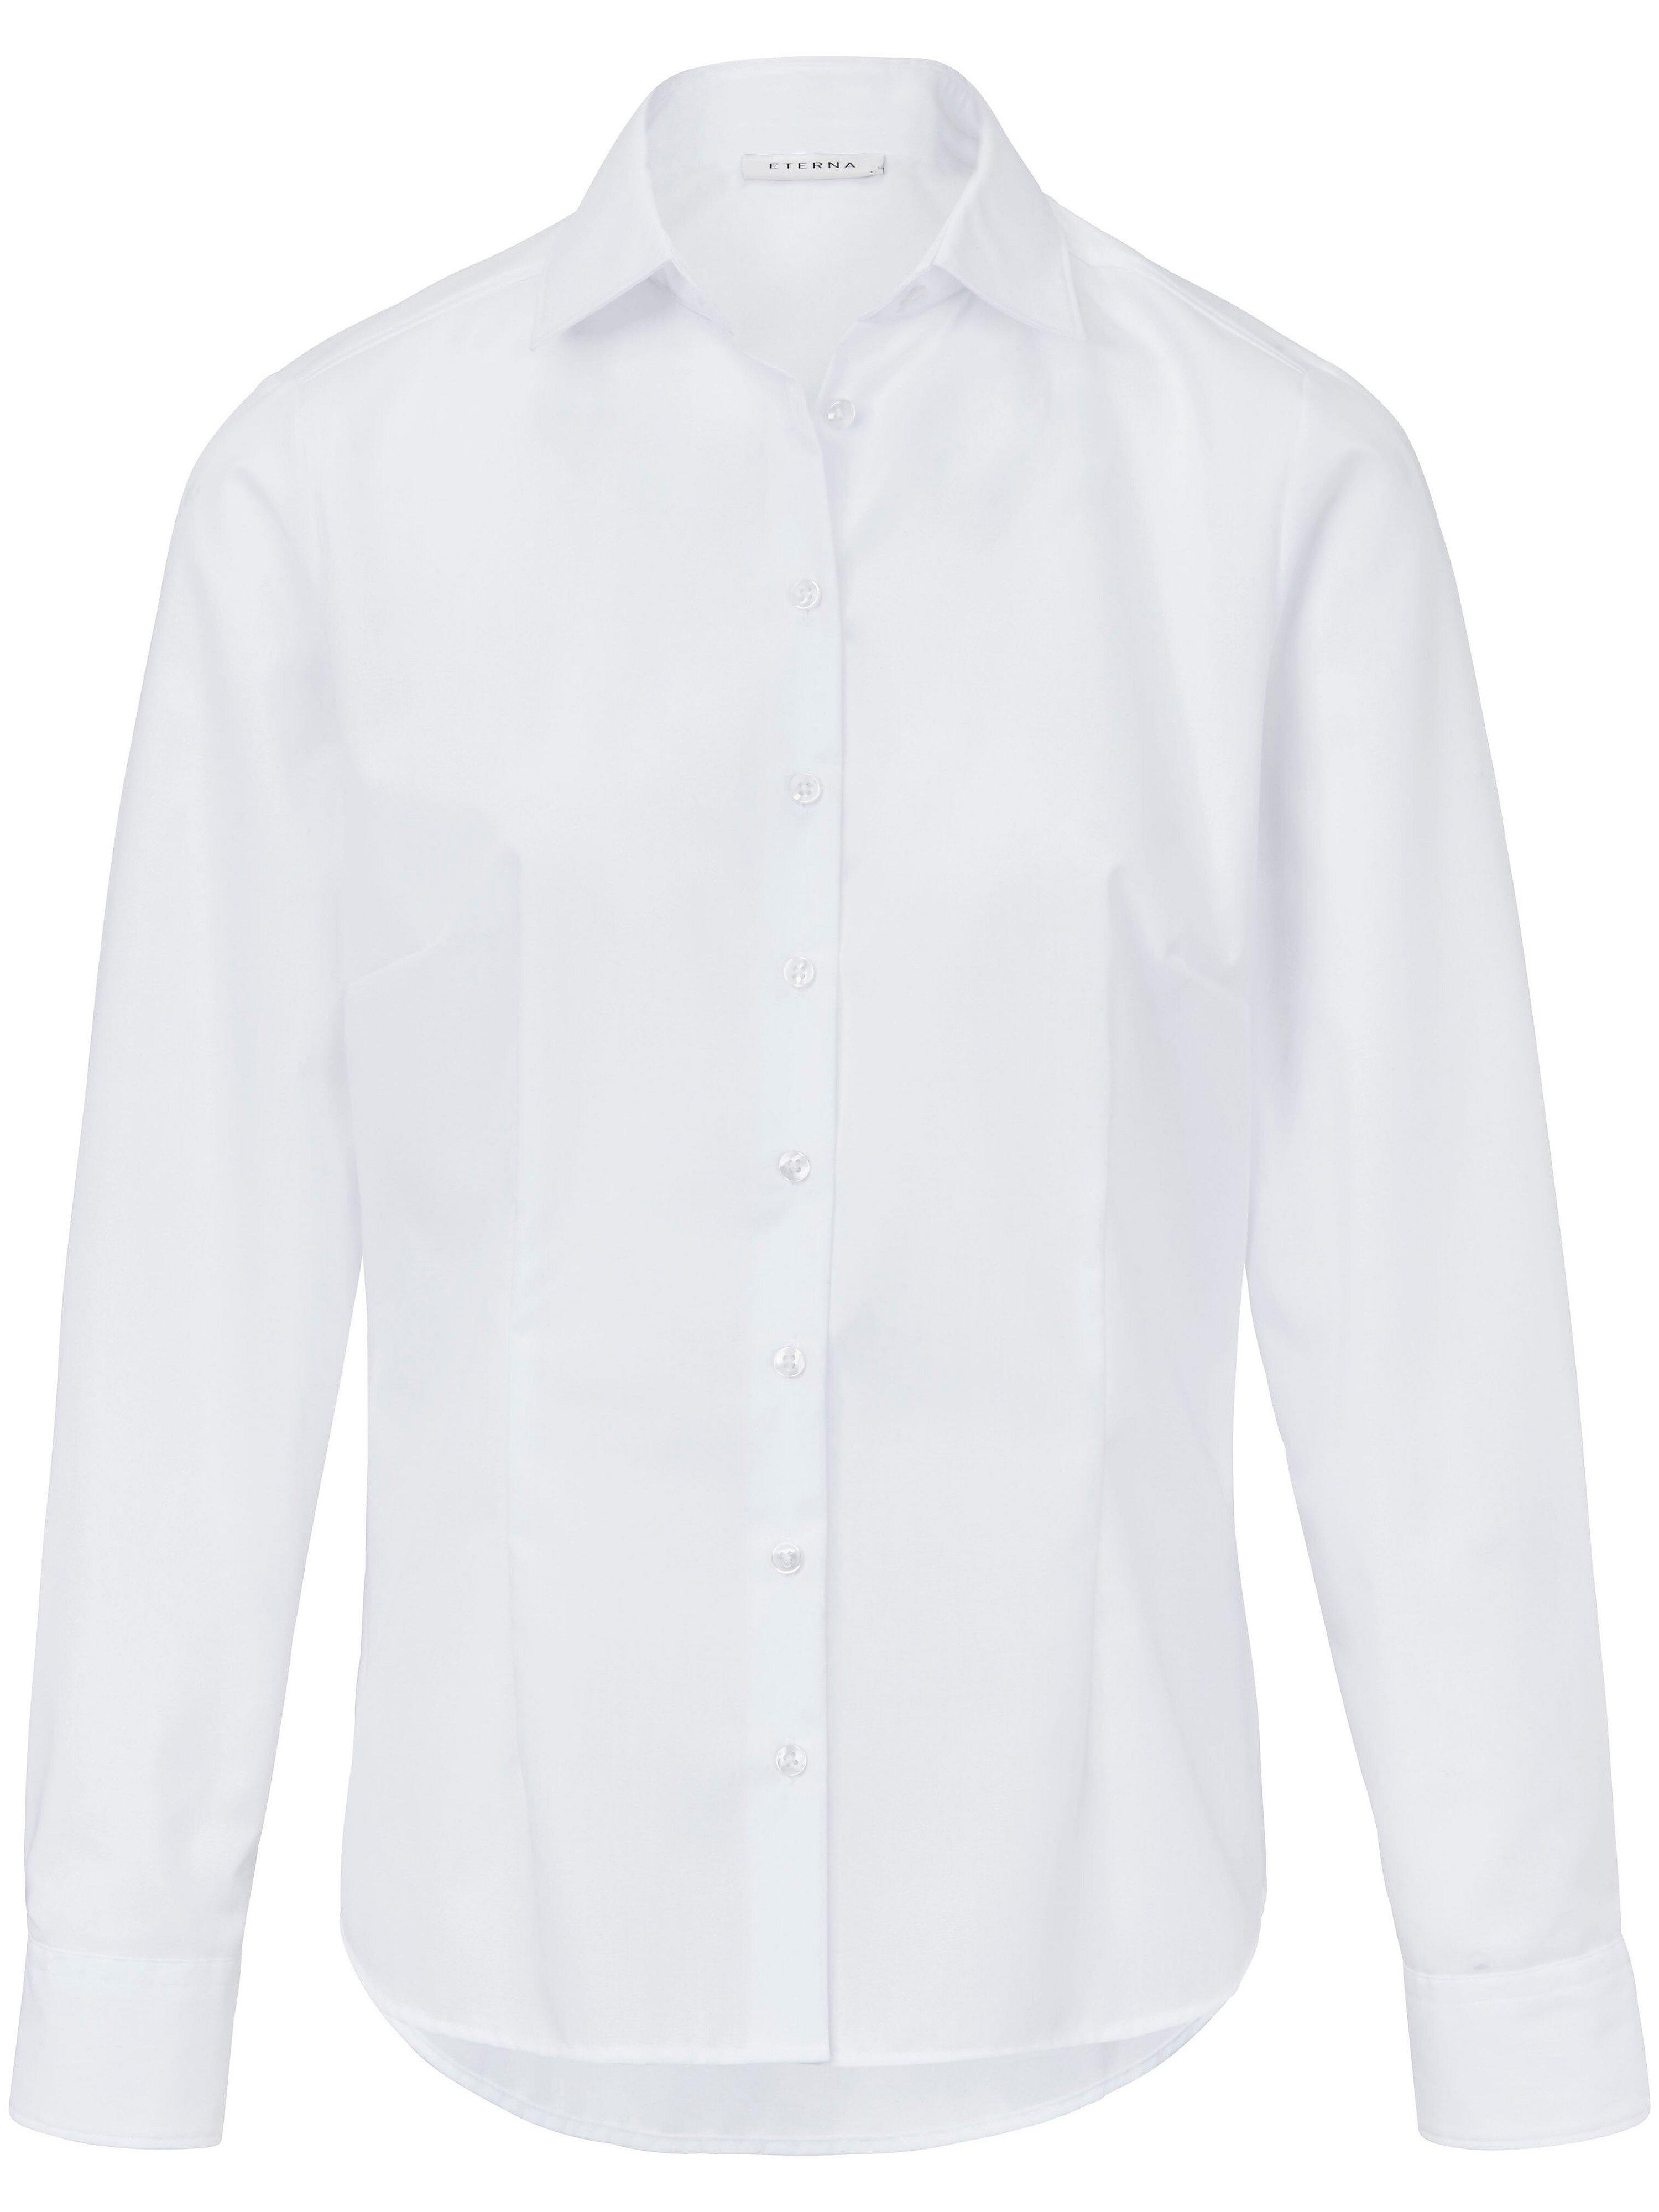 Overhemdblouse lange mouwen Van Eterna wit